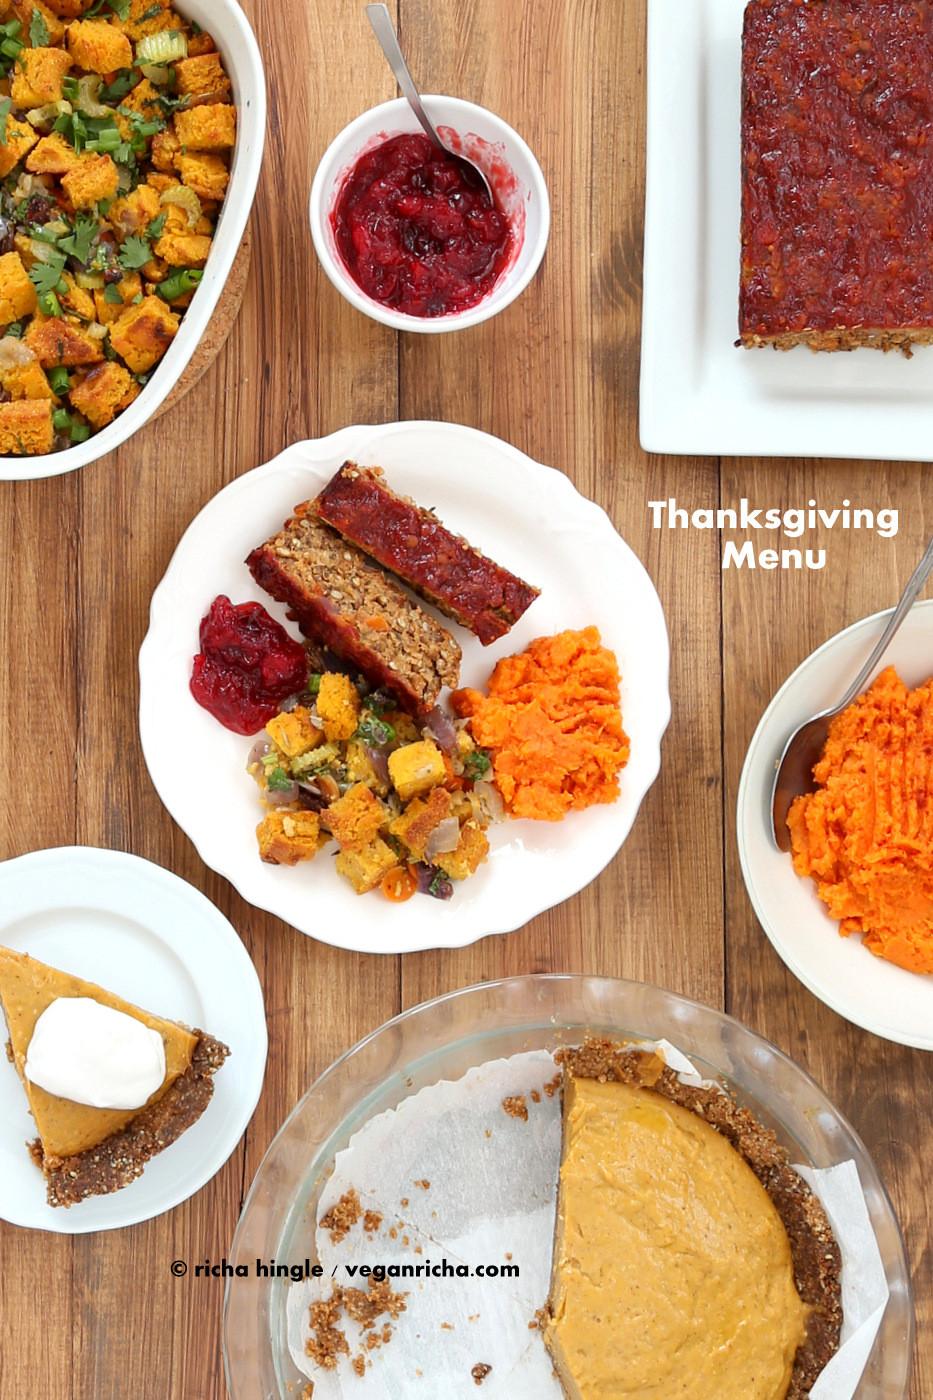 Thanksgiving Recipes Vegan  80 Vegan Thanksgiving Recipes 2014 Vegan Richa